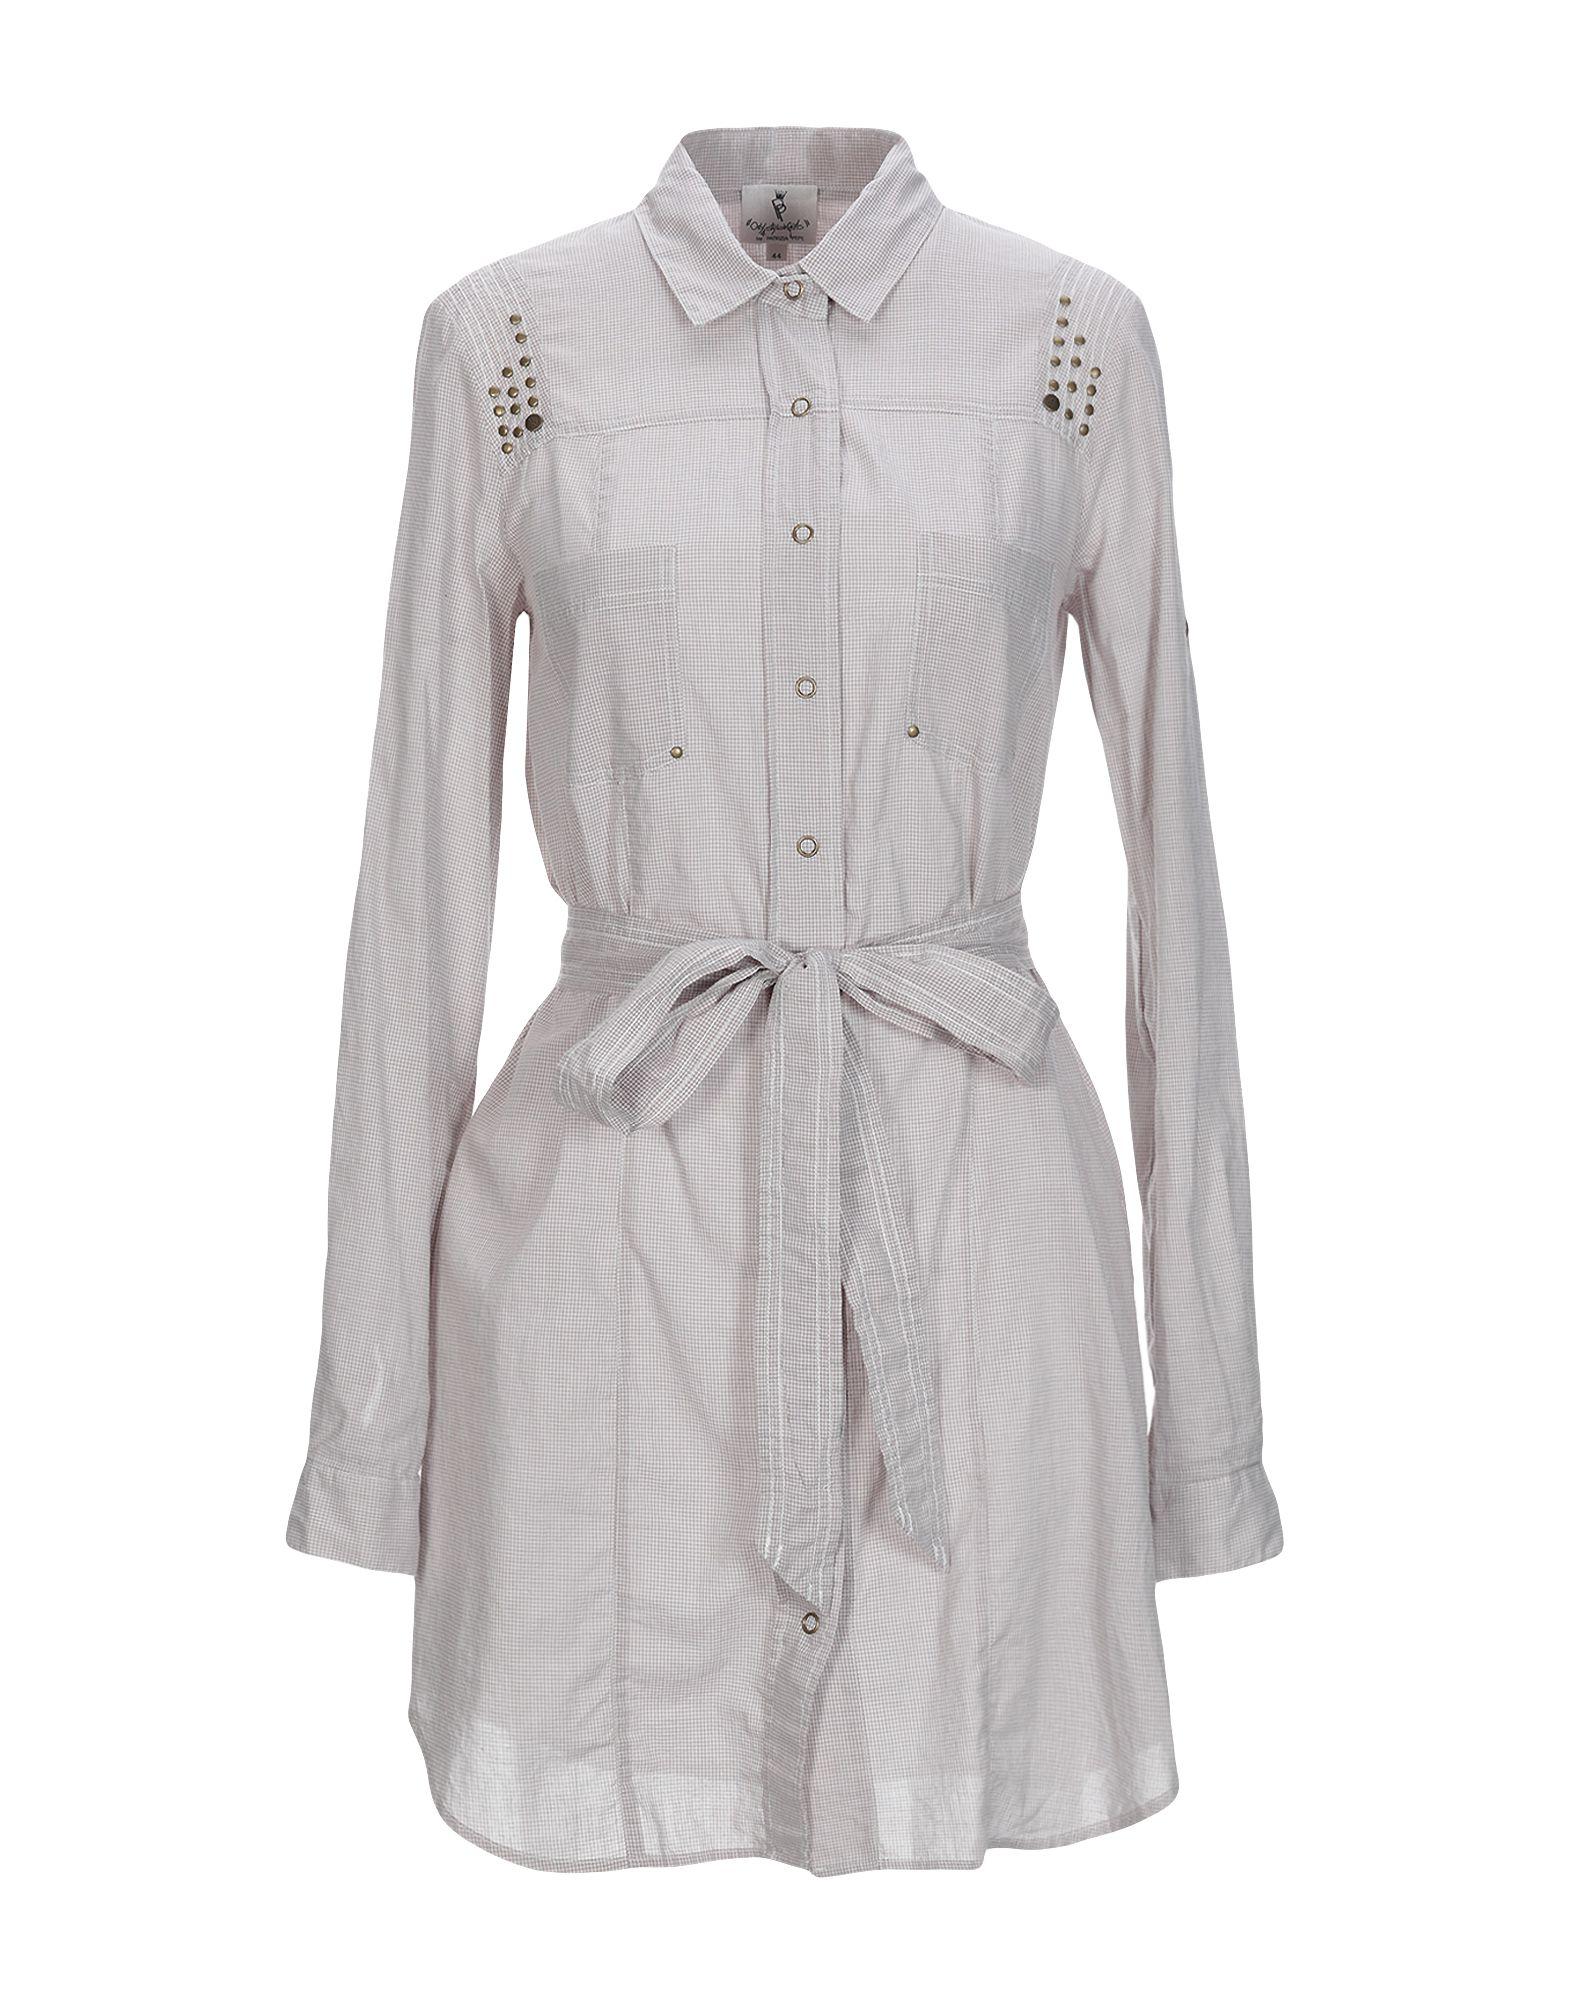 ONLY 4 STYLISH GIRLS by PATRIZIA PEPE Короткое платье платье quelle patrizia dini by heine 5455